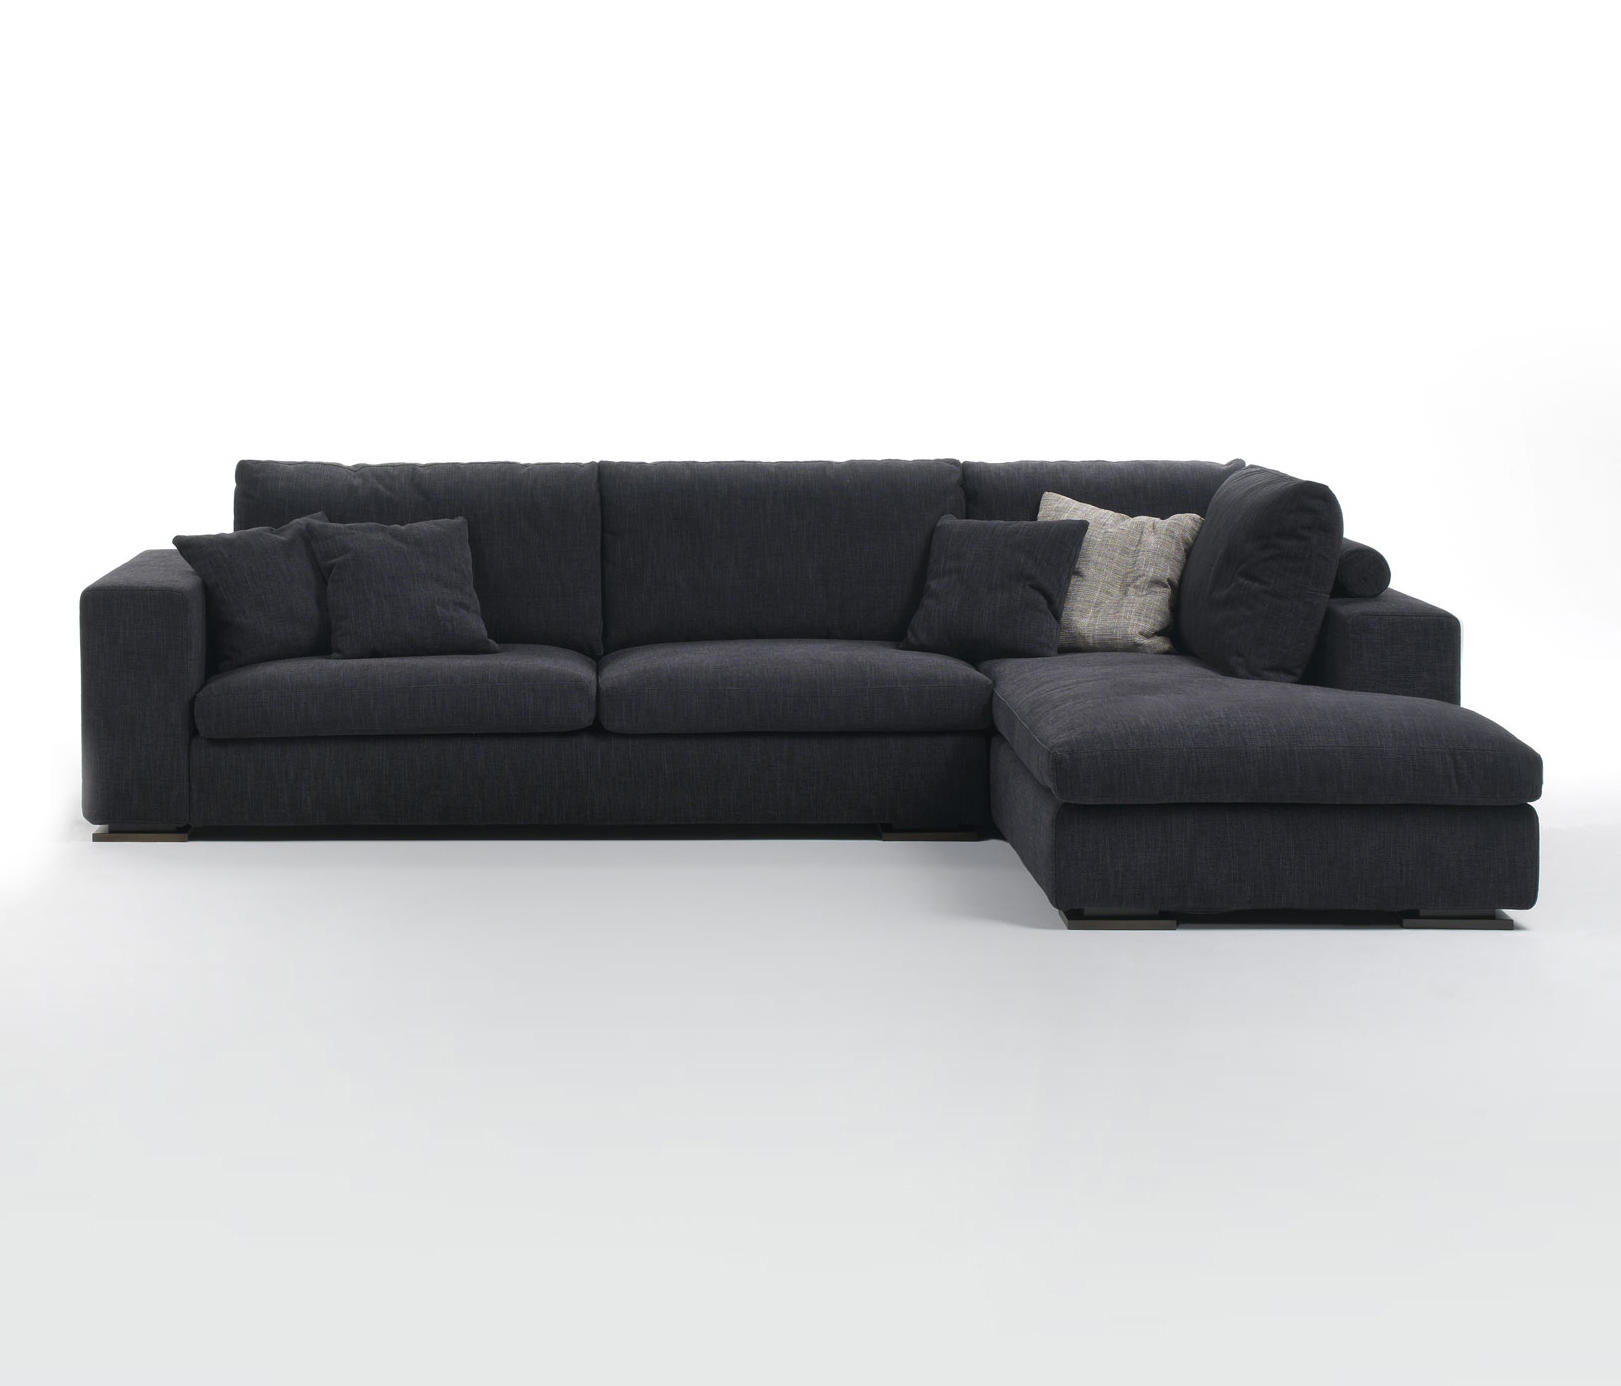 Jack 100 Sofa By Marelli Sofas